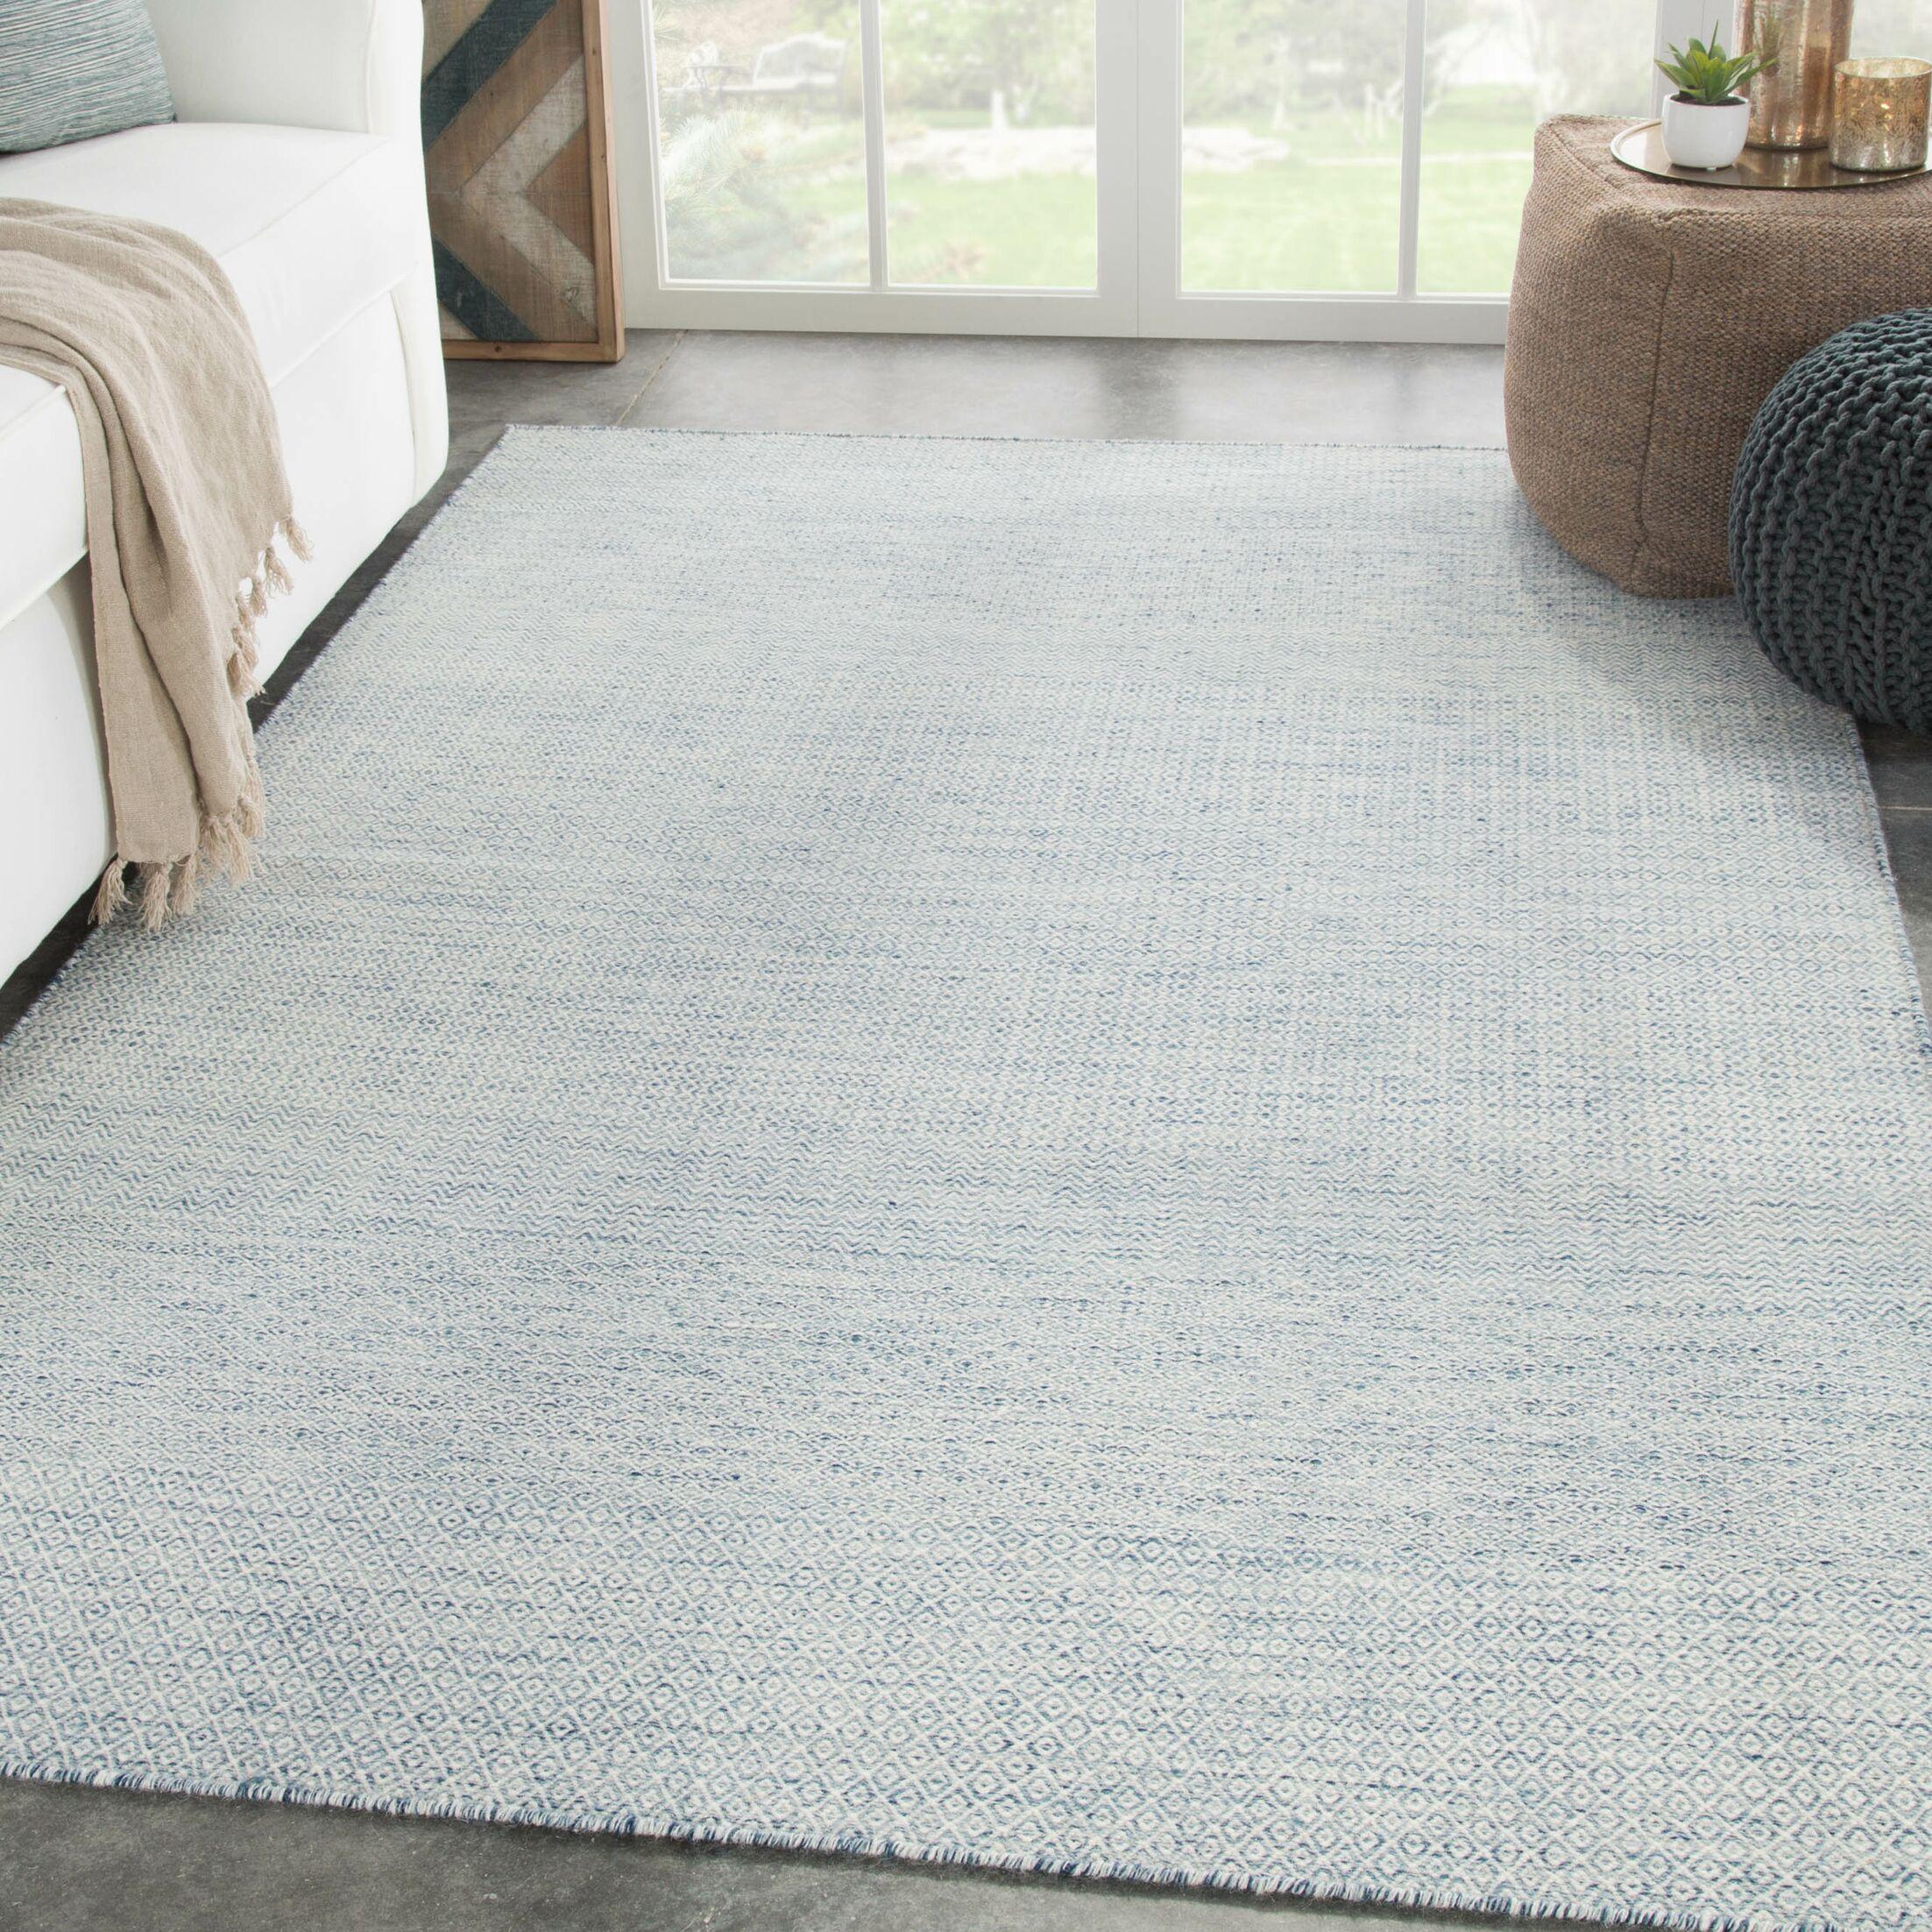 Prescott Geometric Hand-Woven Wool Light Blue/Ivory Area Rug Rug Size: Rectangle 8' x 10'